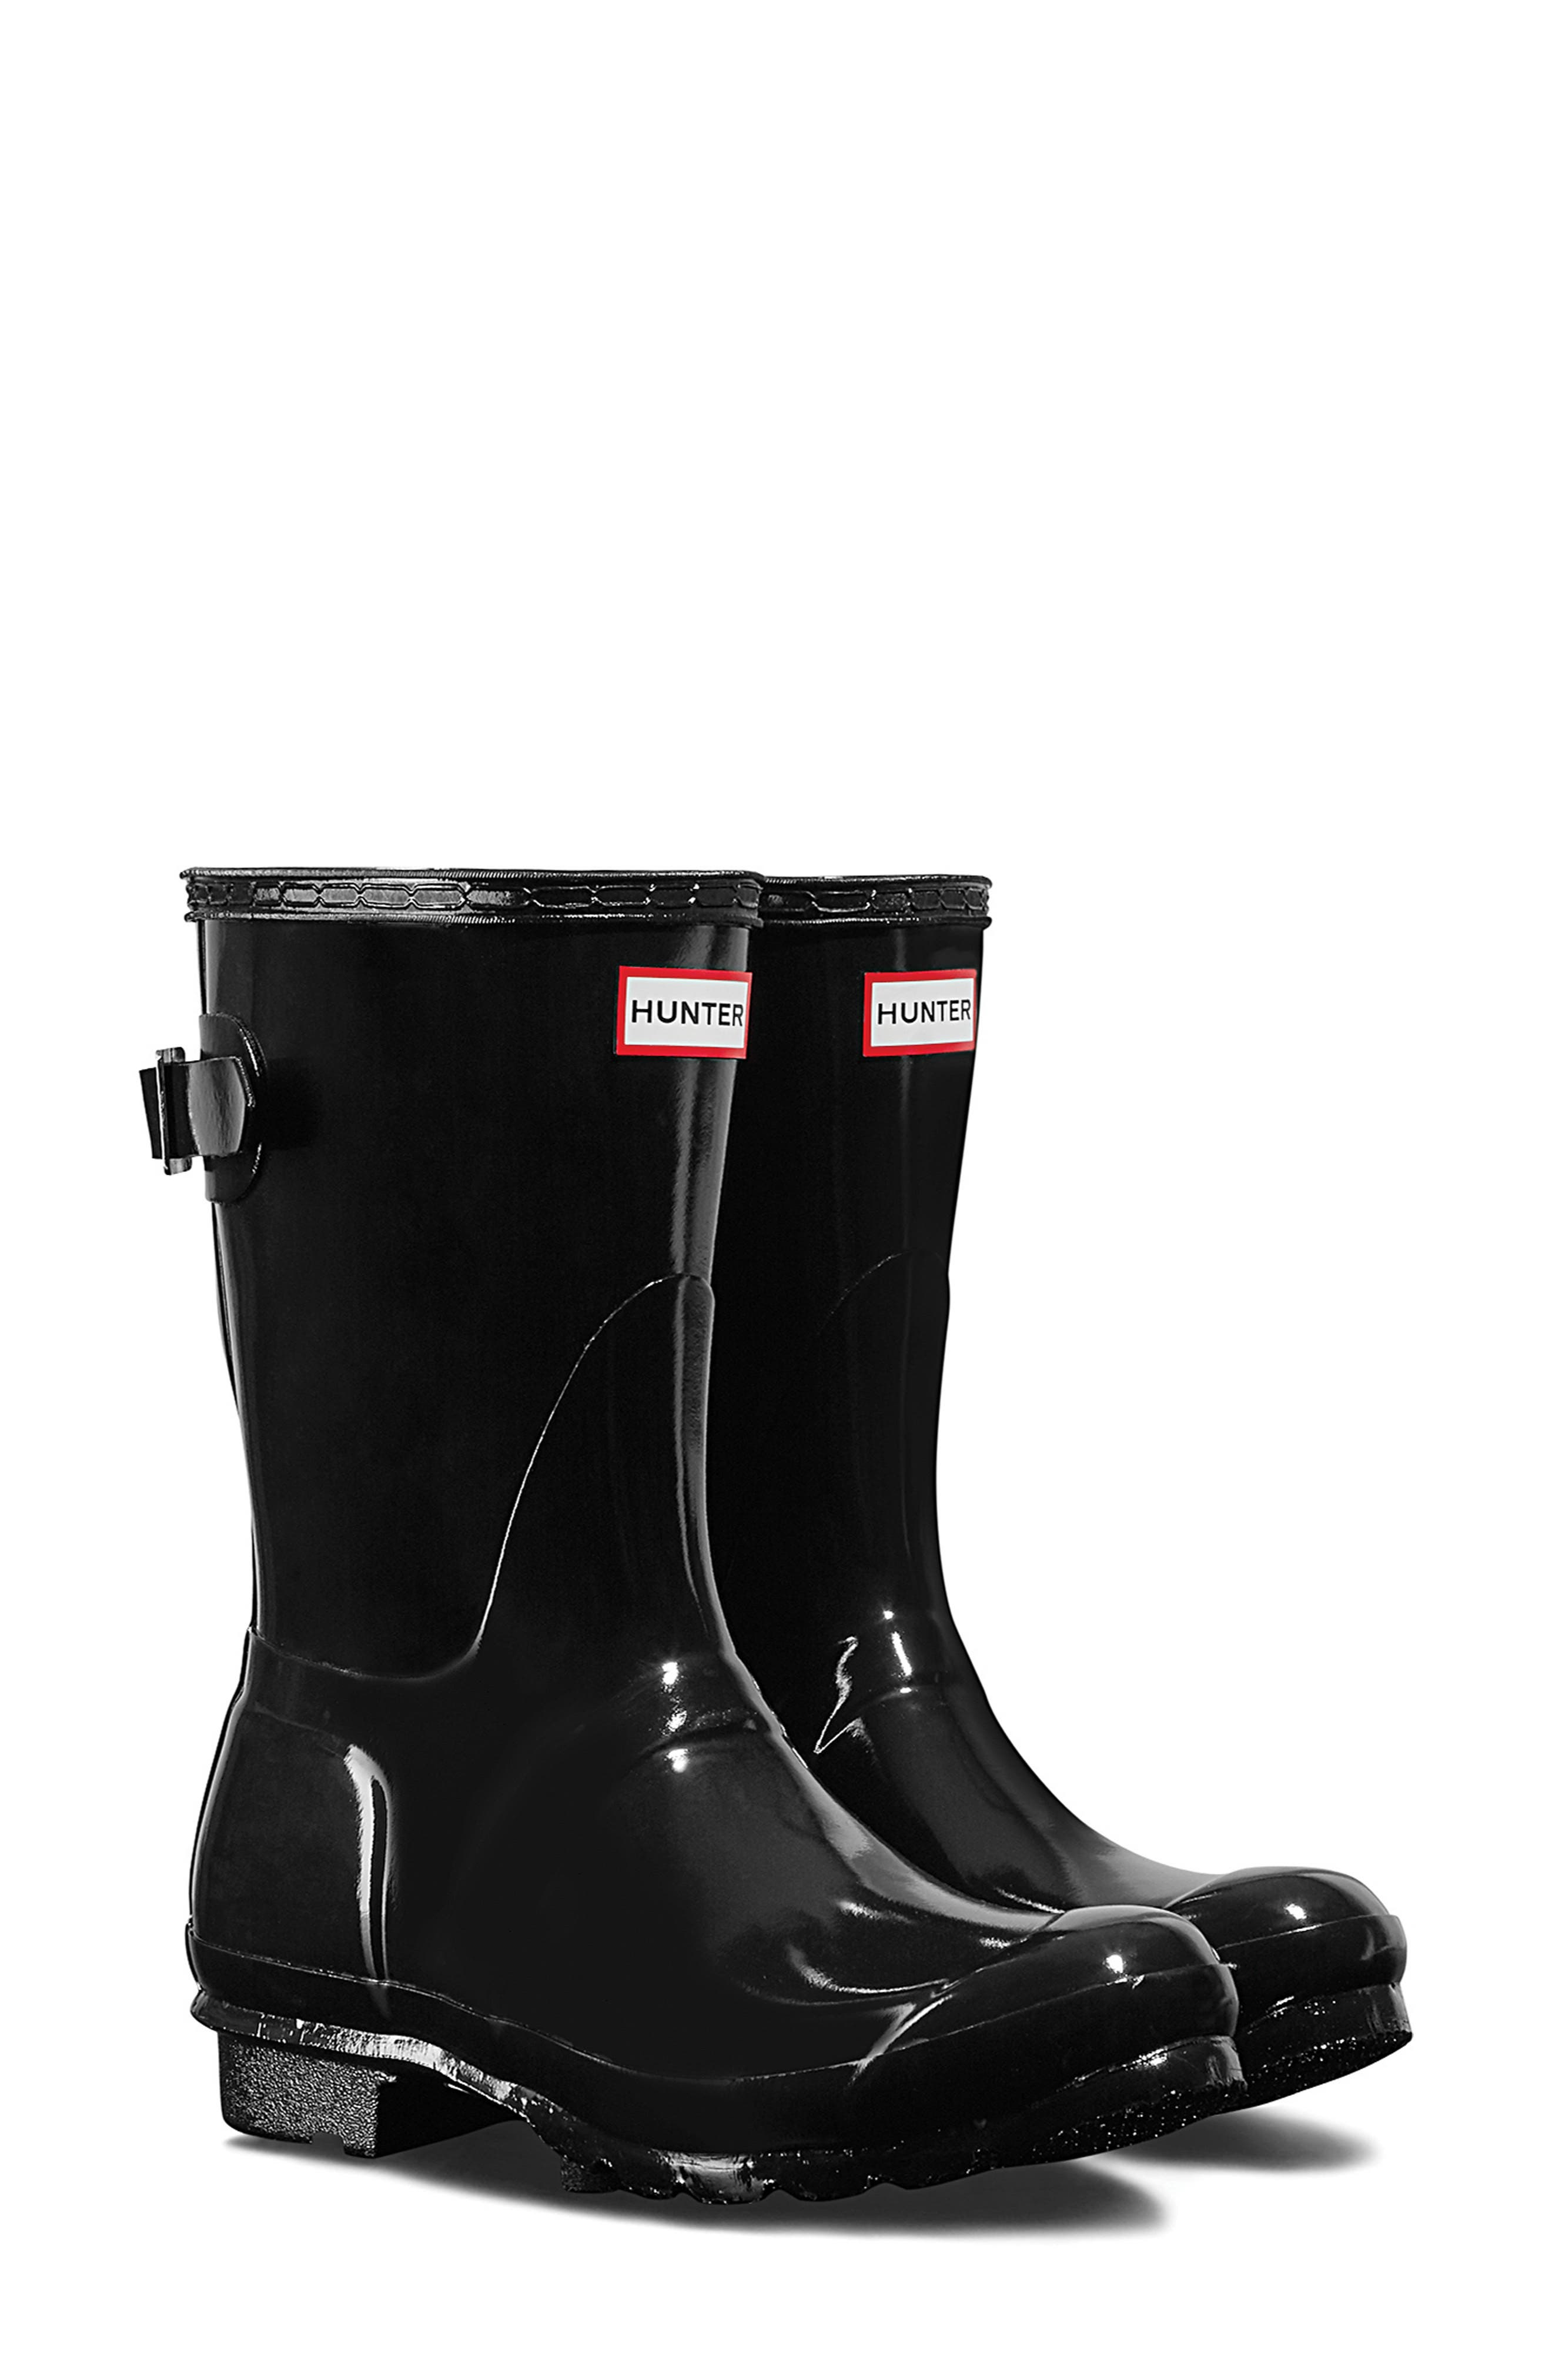 HUNTER Original Short Adjustable Back Gloss Waterproof Rain Boot, Main, color, BLACK